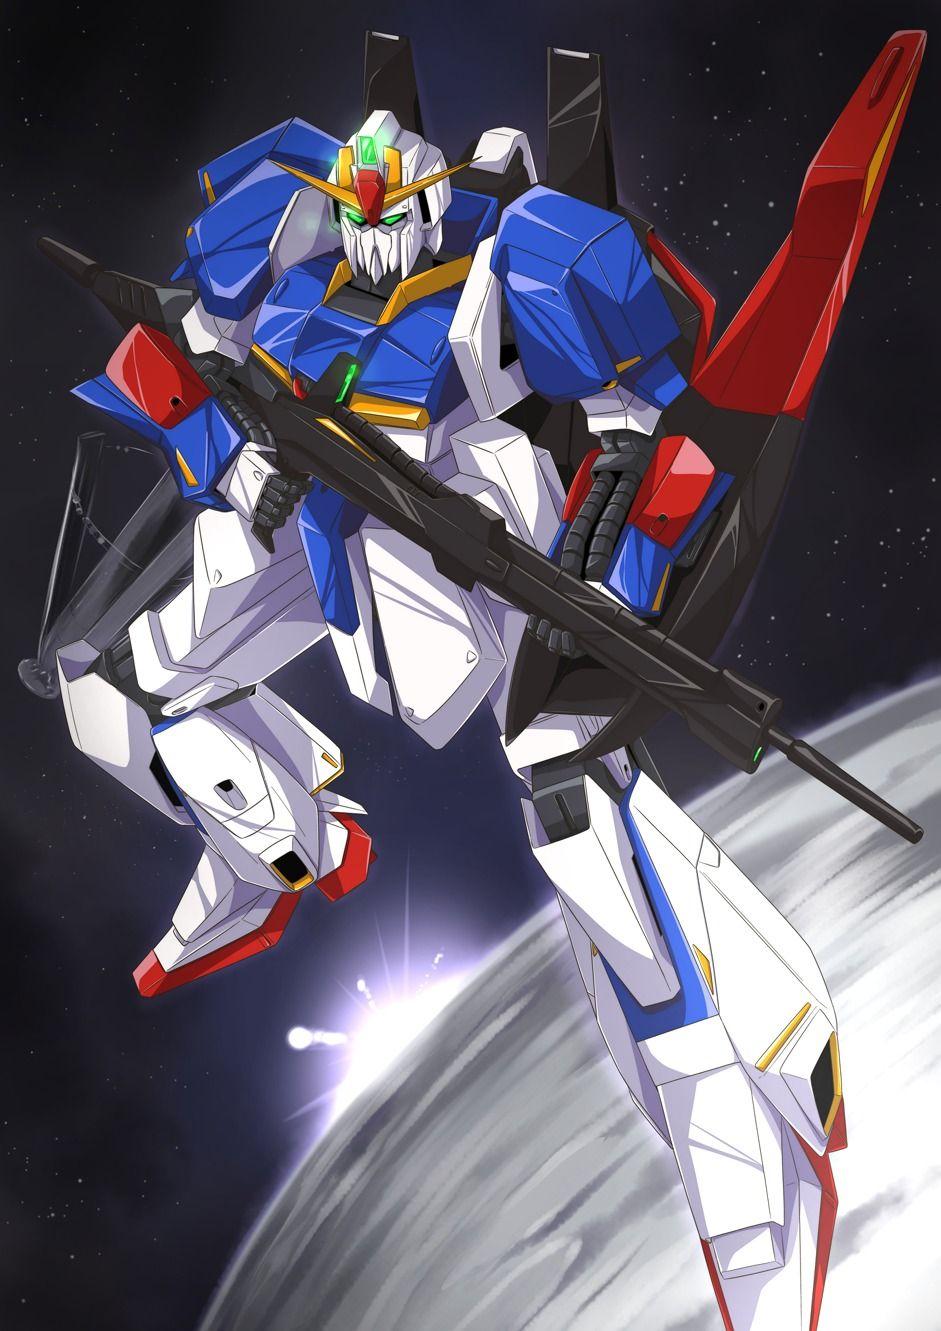 「Mobile Suit Zeta Gundam/A New Translation」おしゃれまとめの人気アイデア